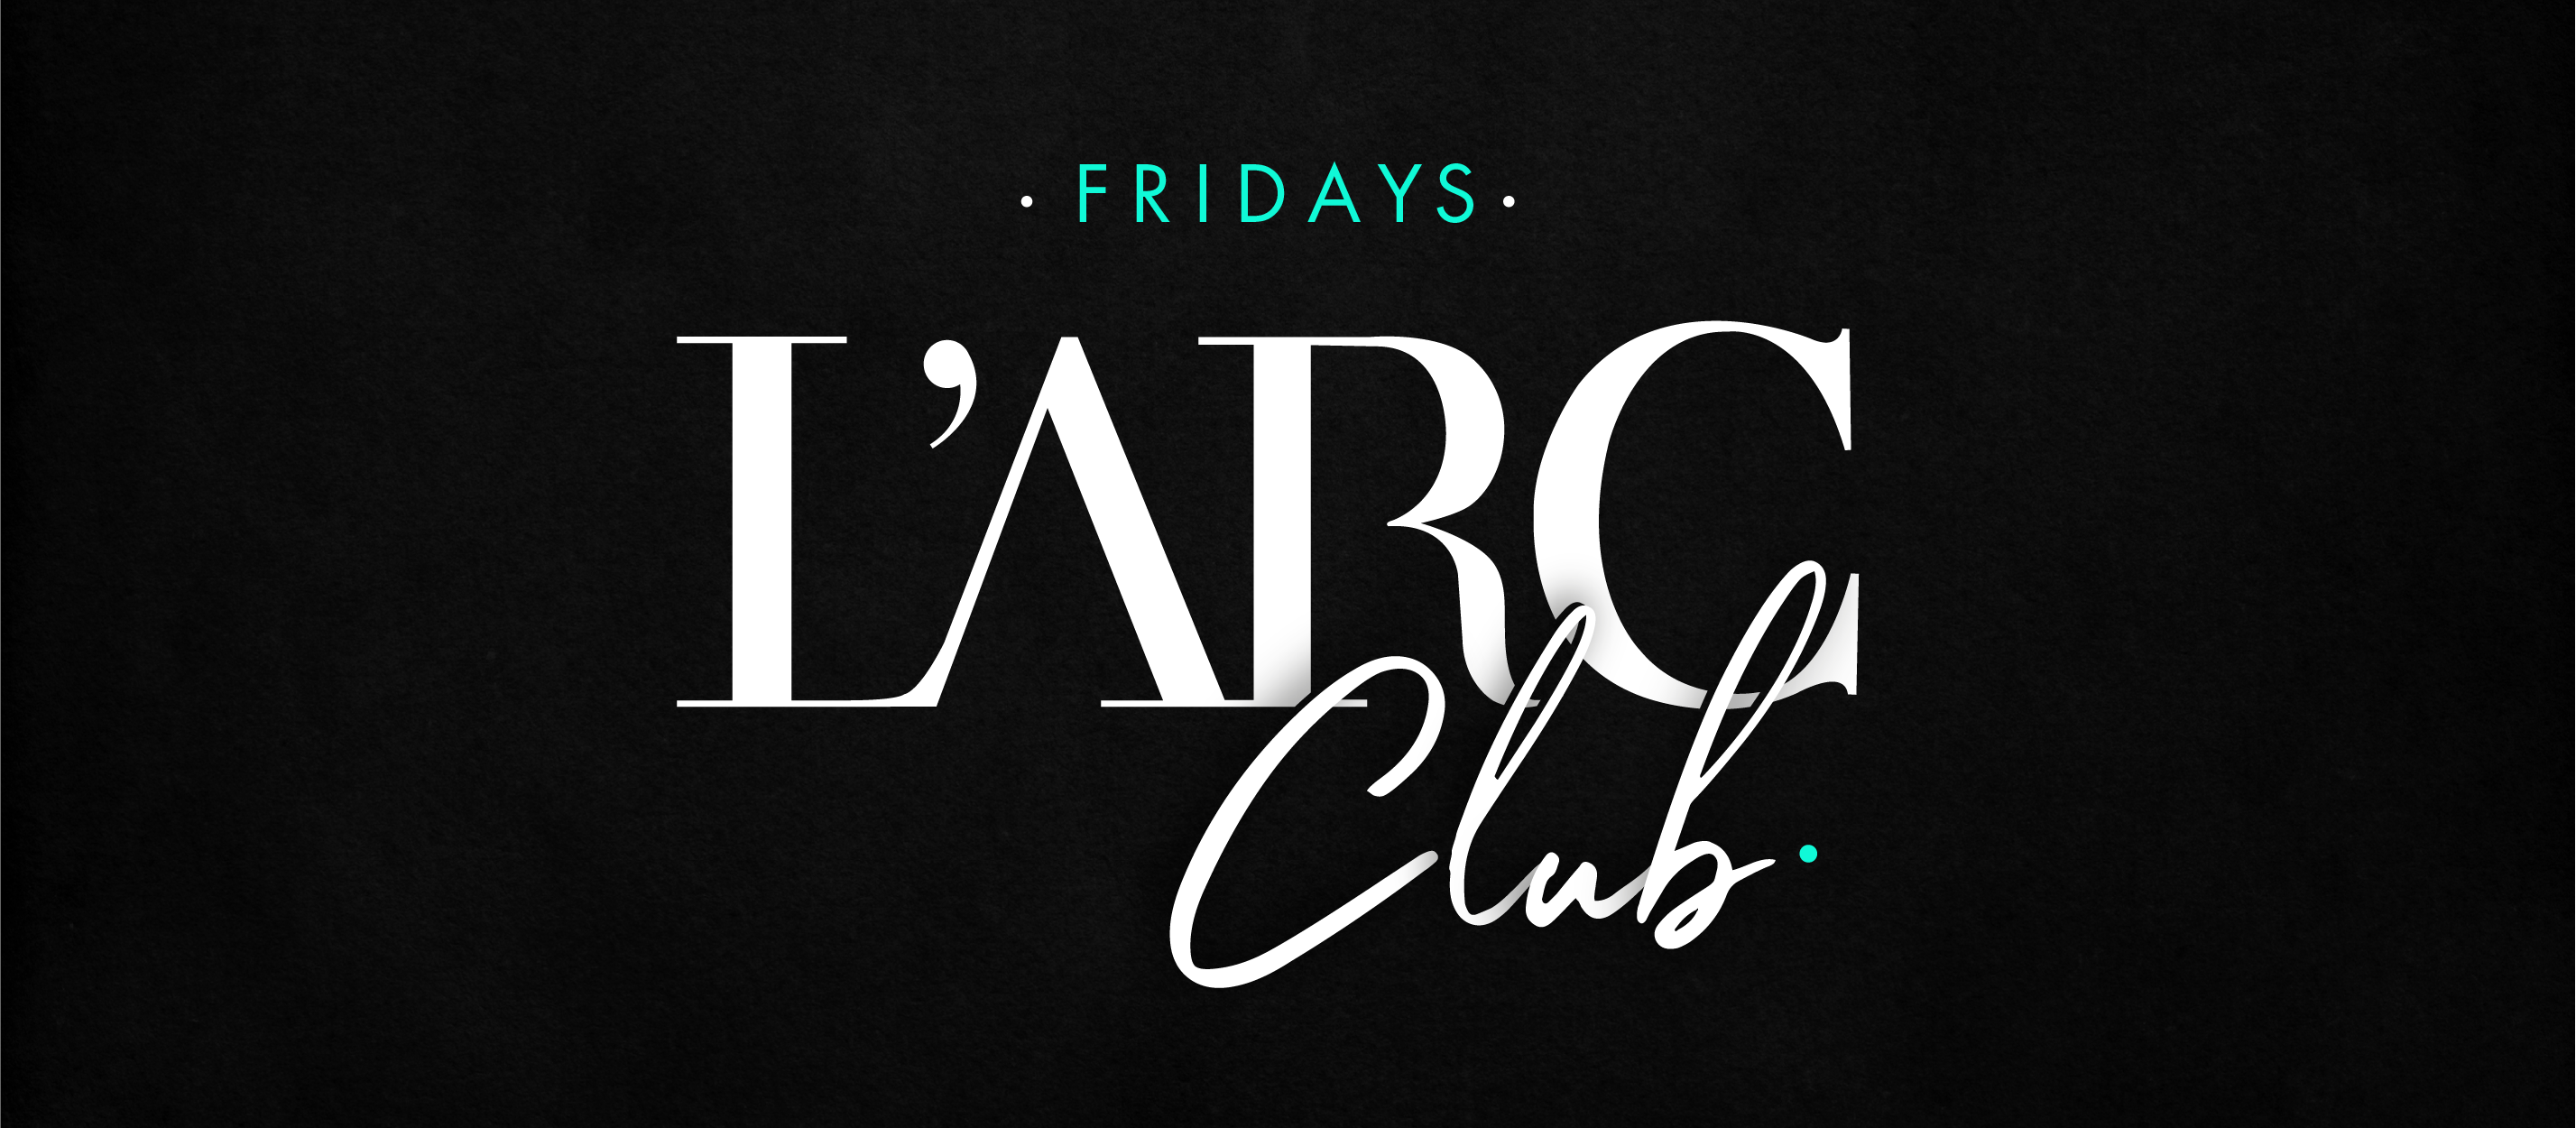 Larc Club - Opening 14/02